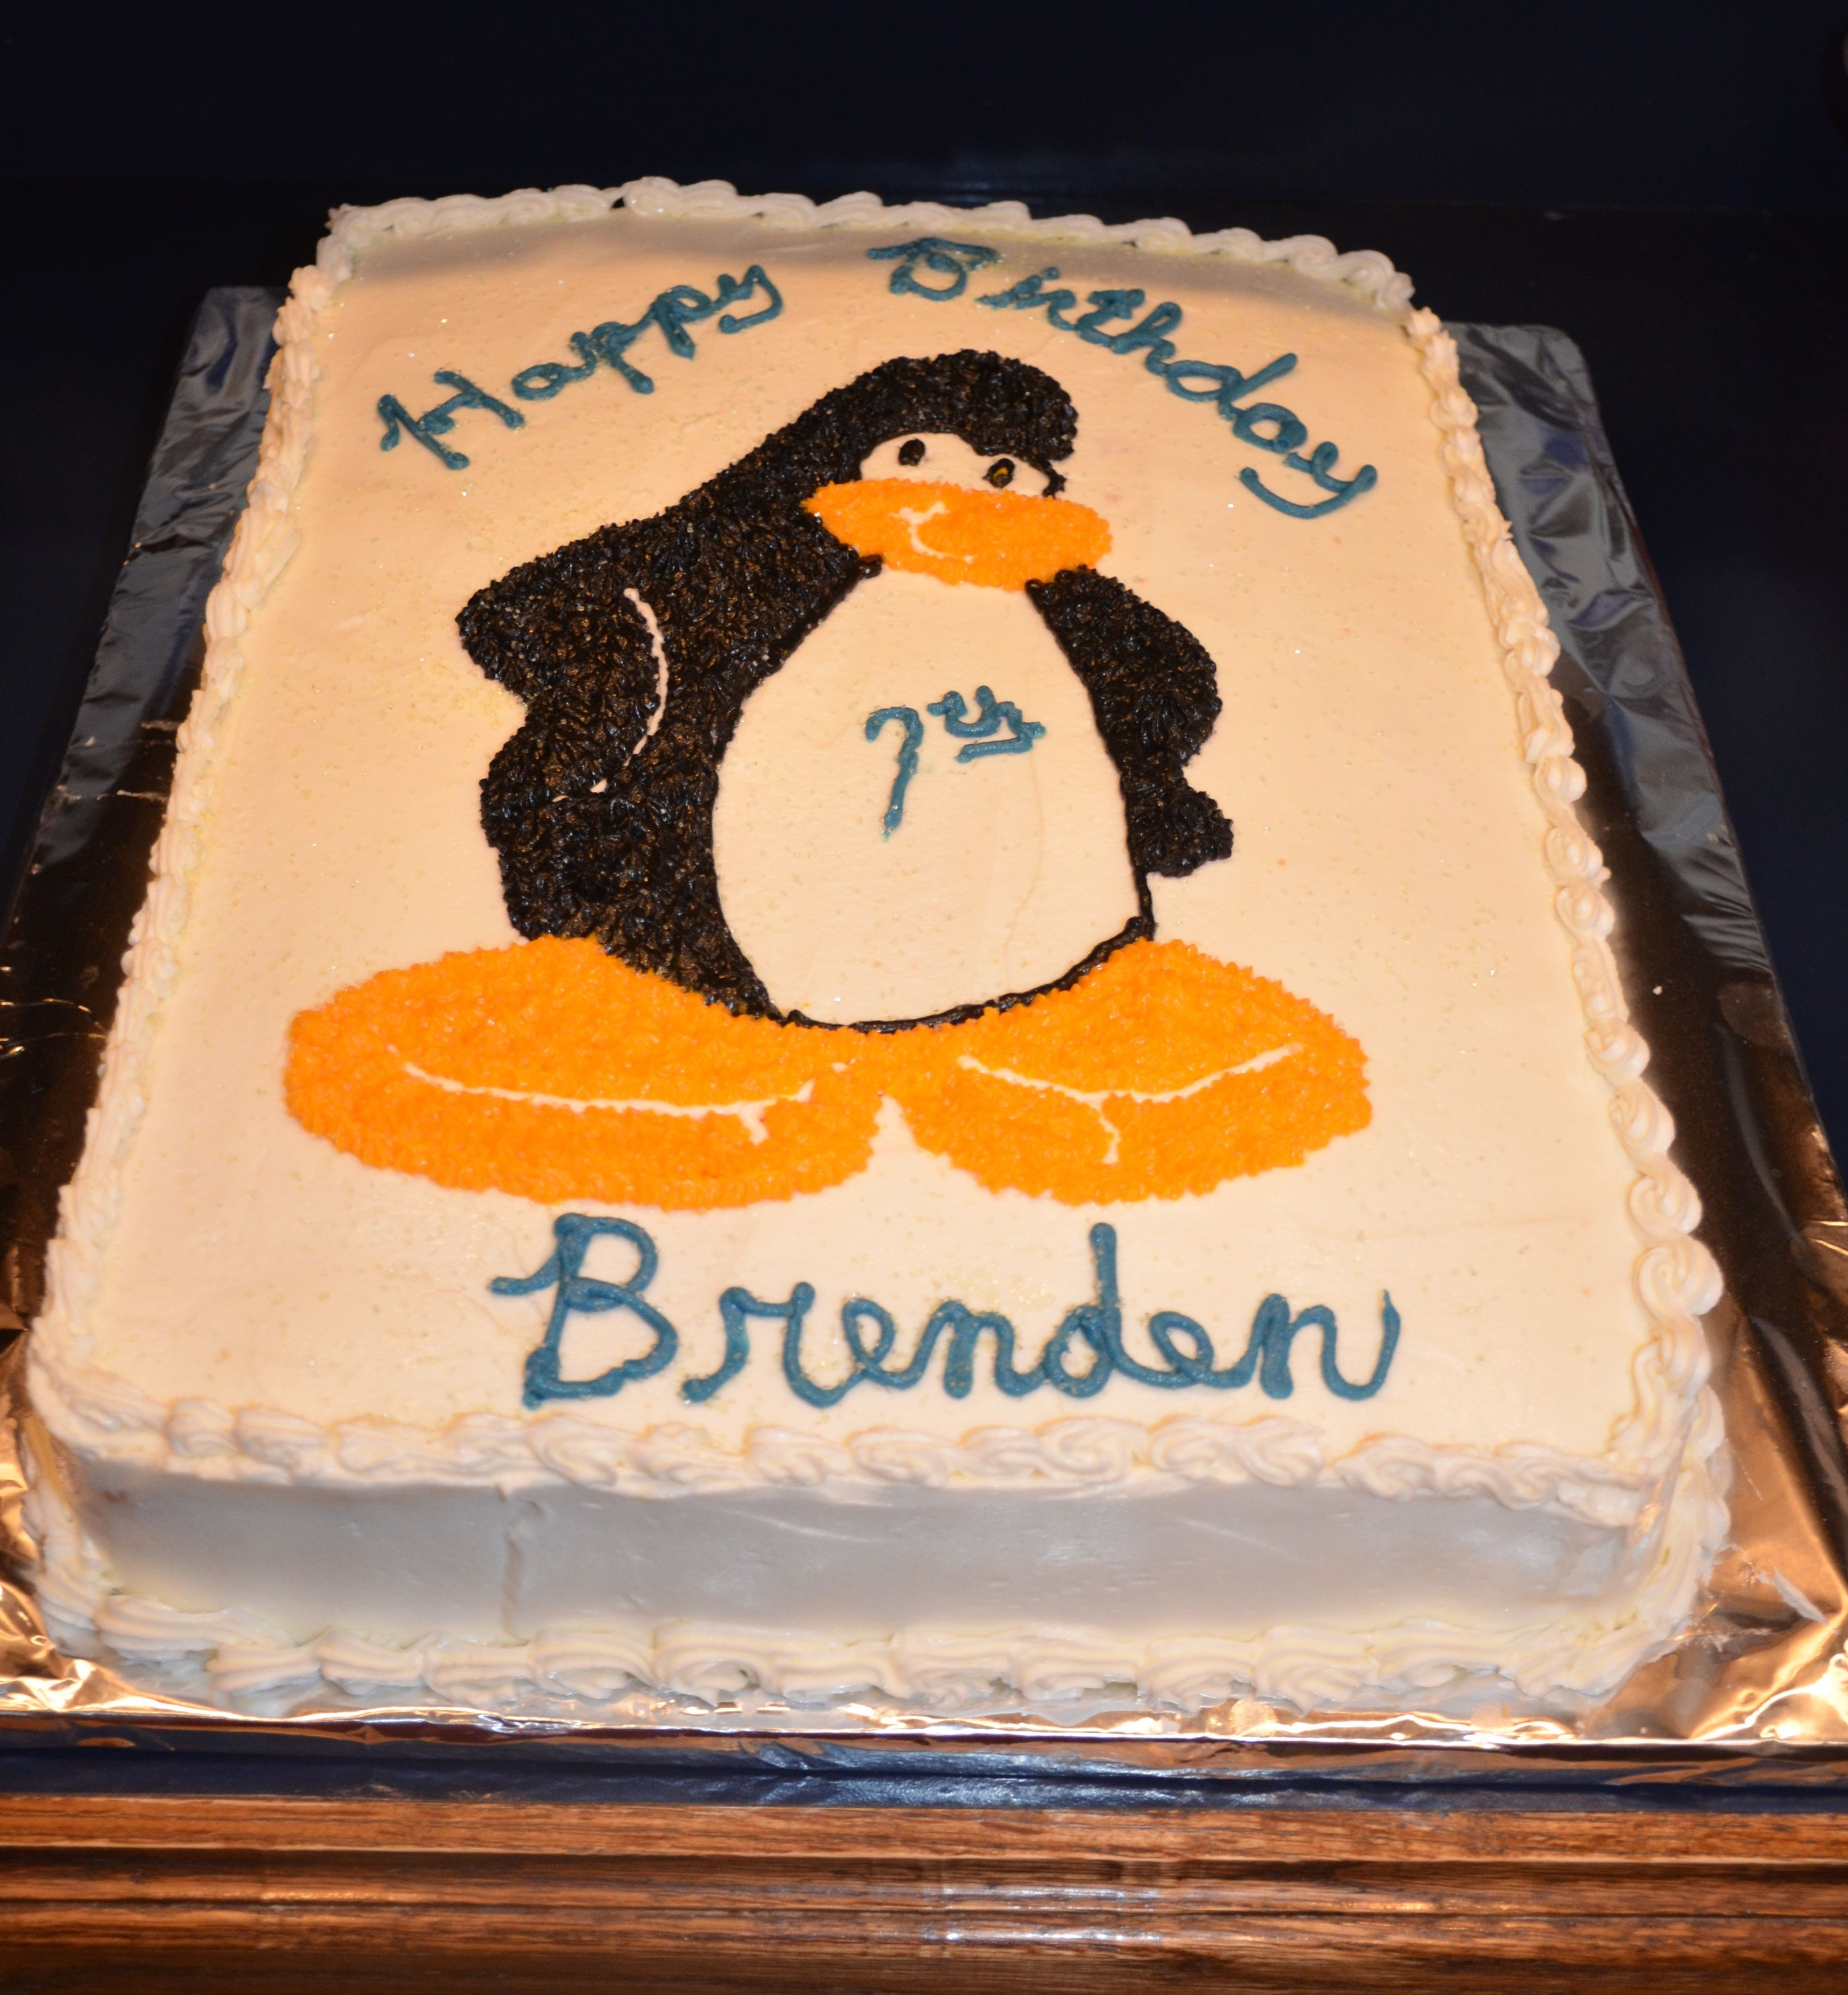 Brendens Club Penguin Cake 42614 Photo by Cathy Pfaff Mahnke